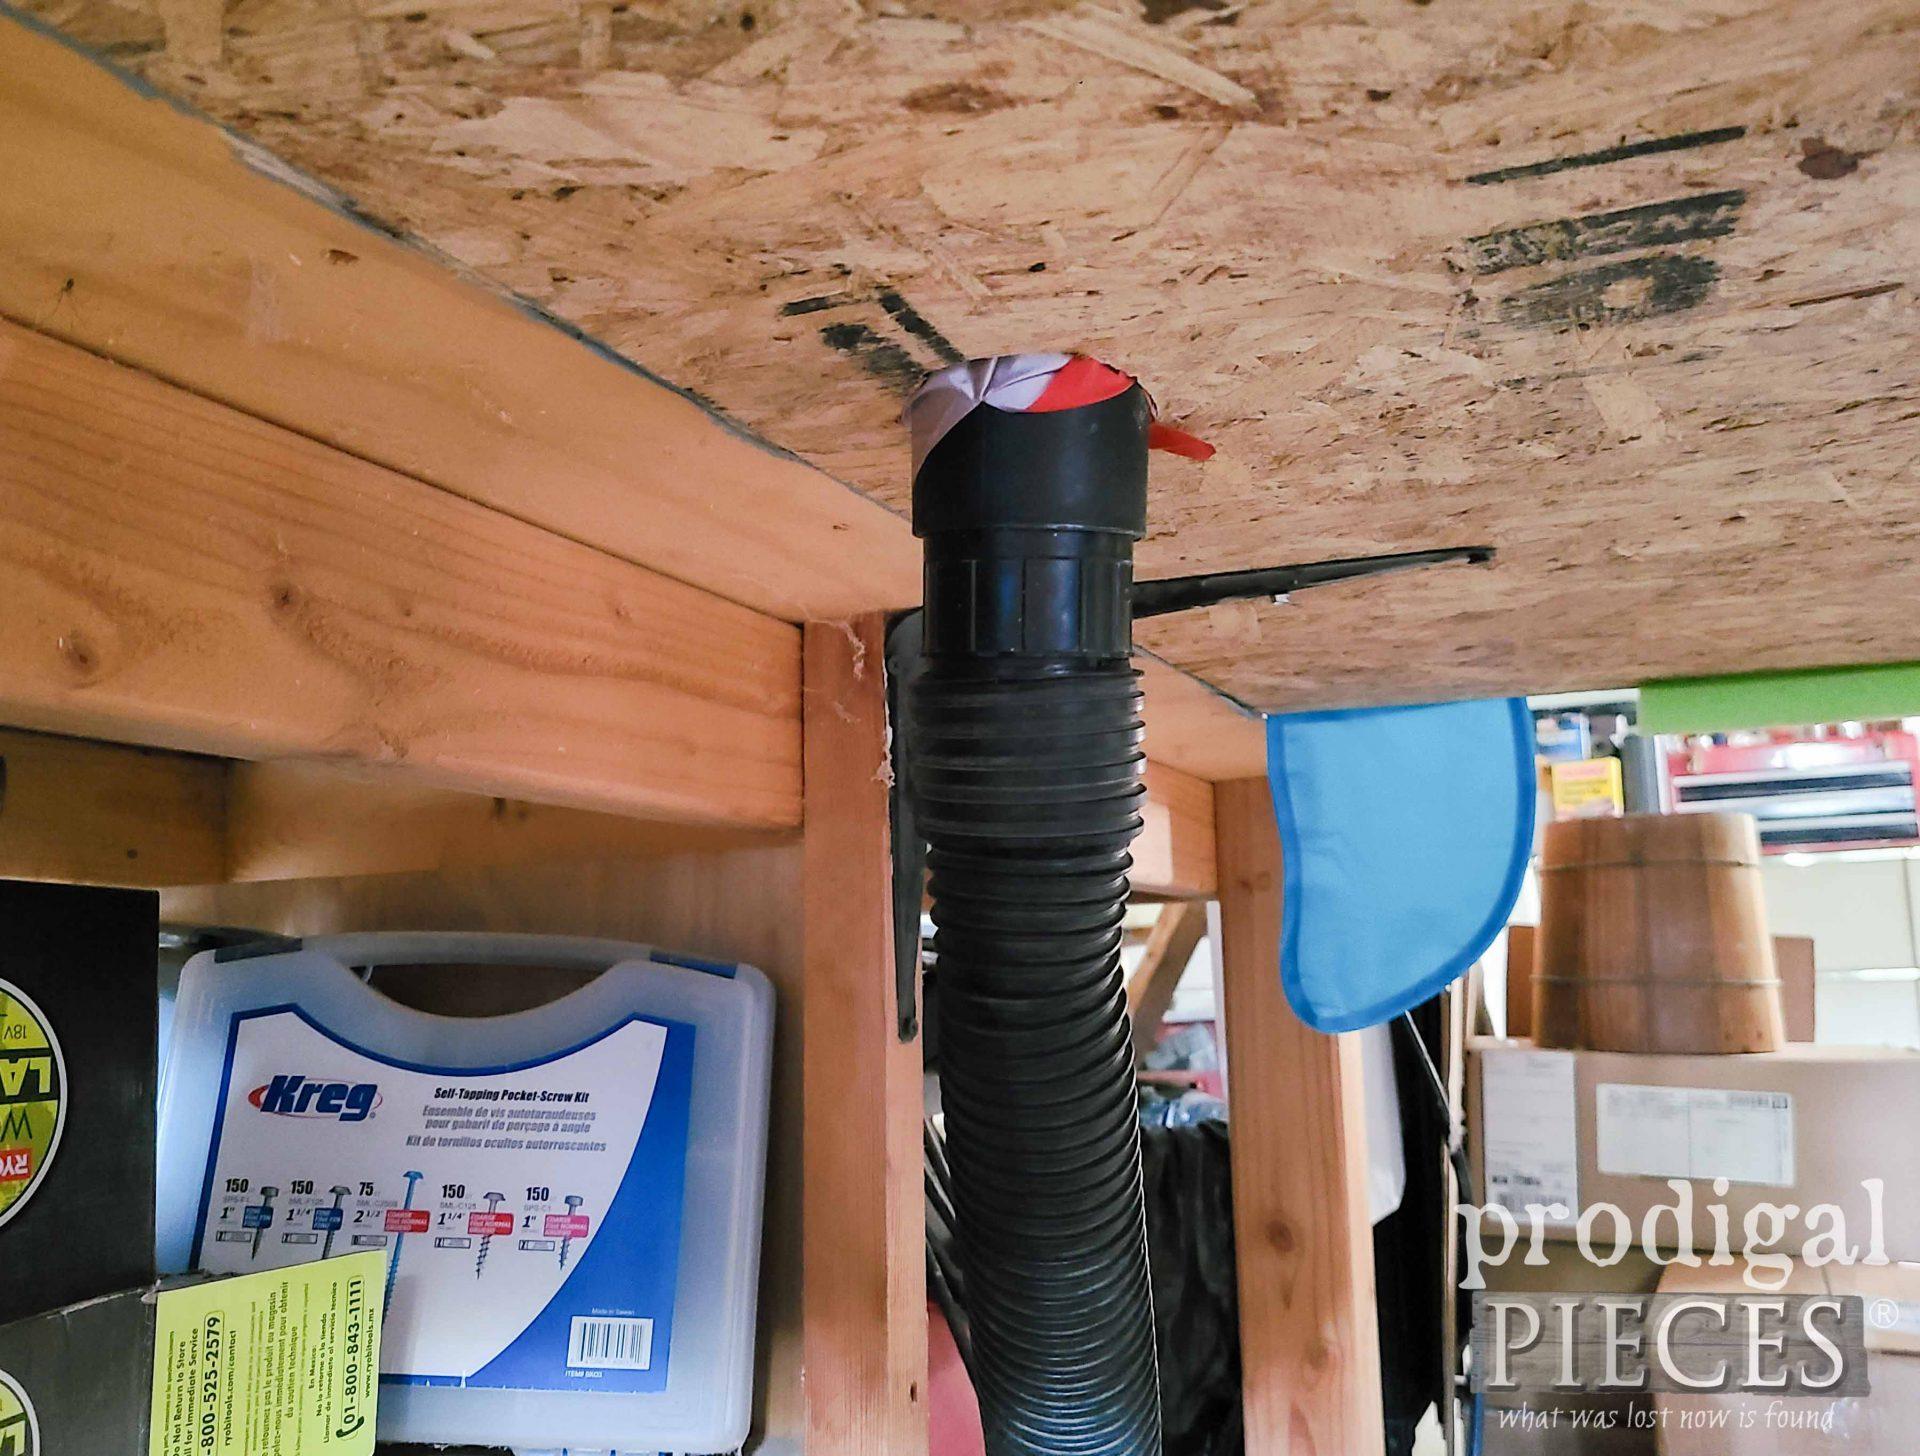 Shop Vacuum Attachment for DIY Miter Saw Dust Hood by Prodigal Pieces   prodigalpieces.com